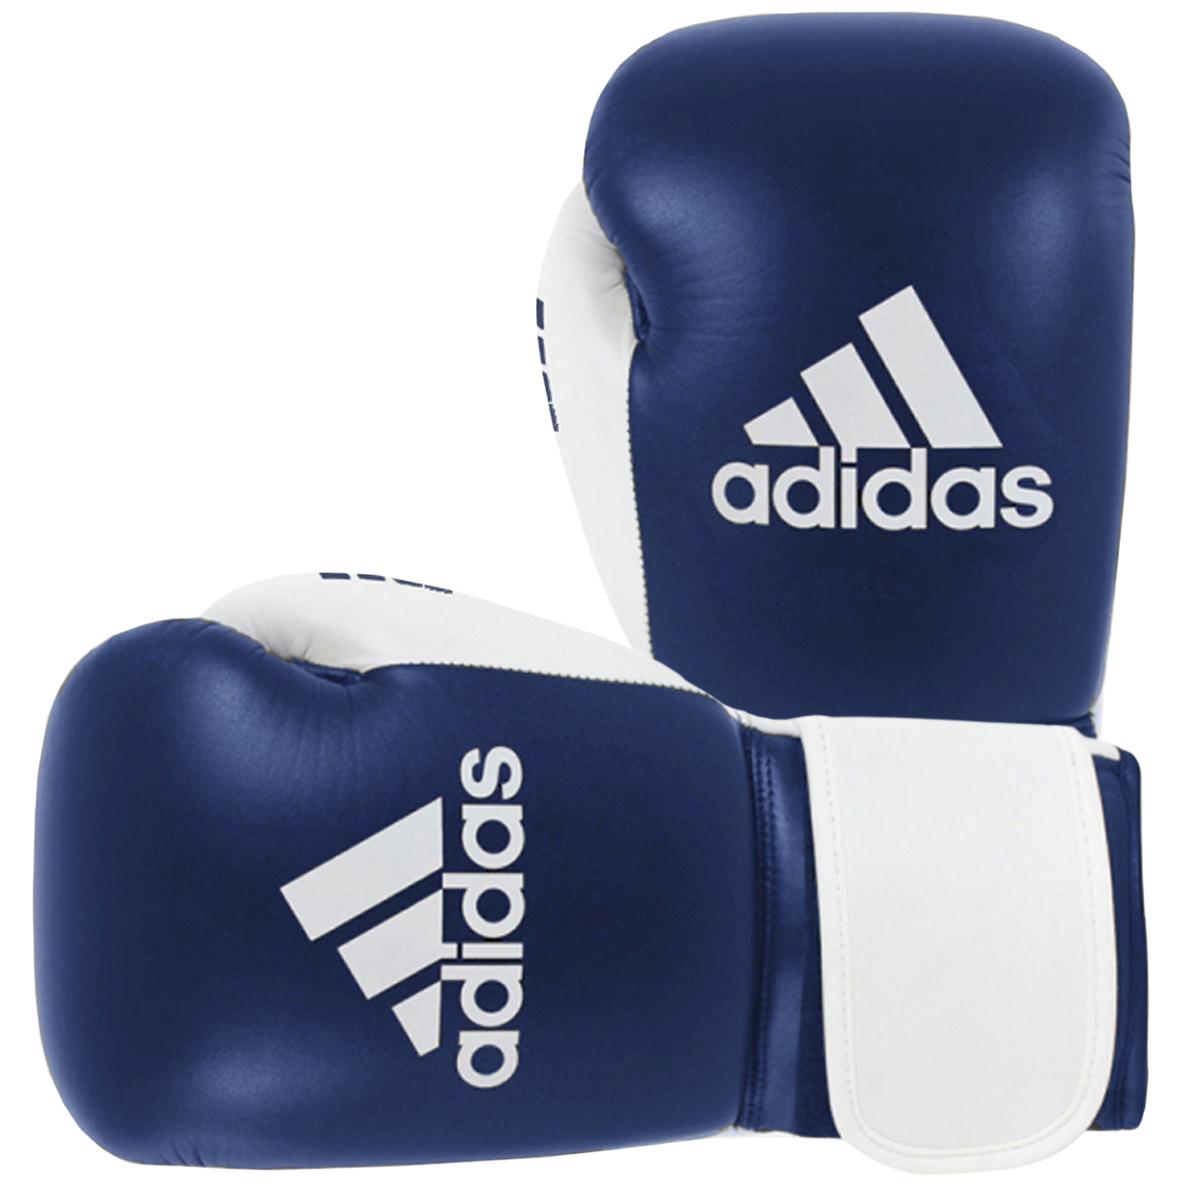 adidas boxing gloves adidas-glory-professional-hook-and-loop-boxing-gloves BHHKAUK